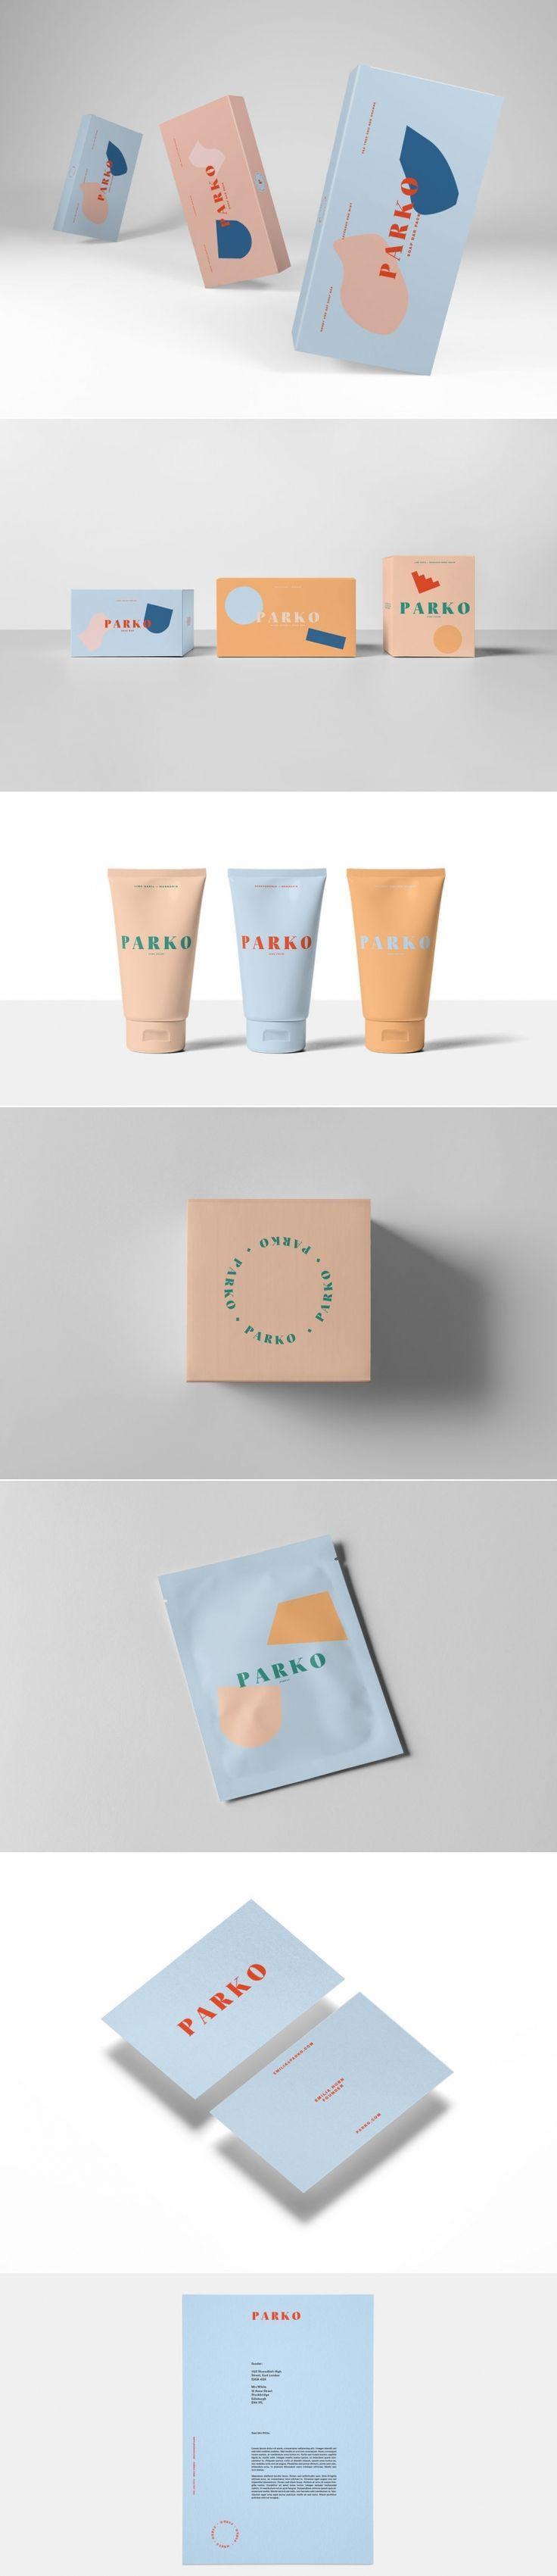 Parko is Bringing Freshness To Your Skin — The Dieline | Packaging & Branding Design & Innovation News